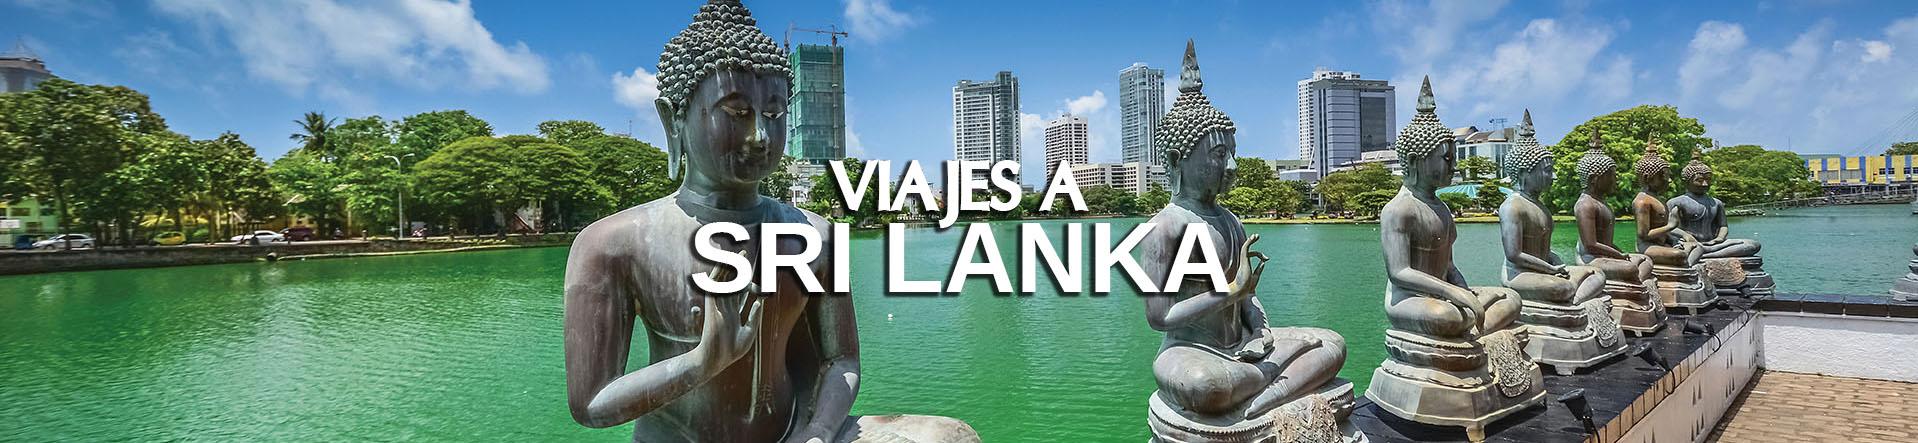 Sri Lanka desde Argentina